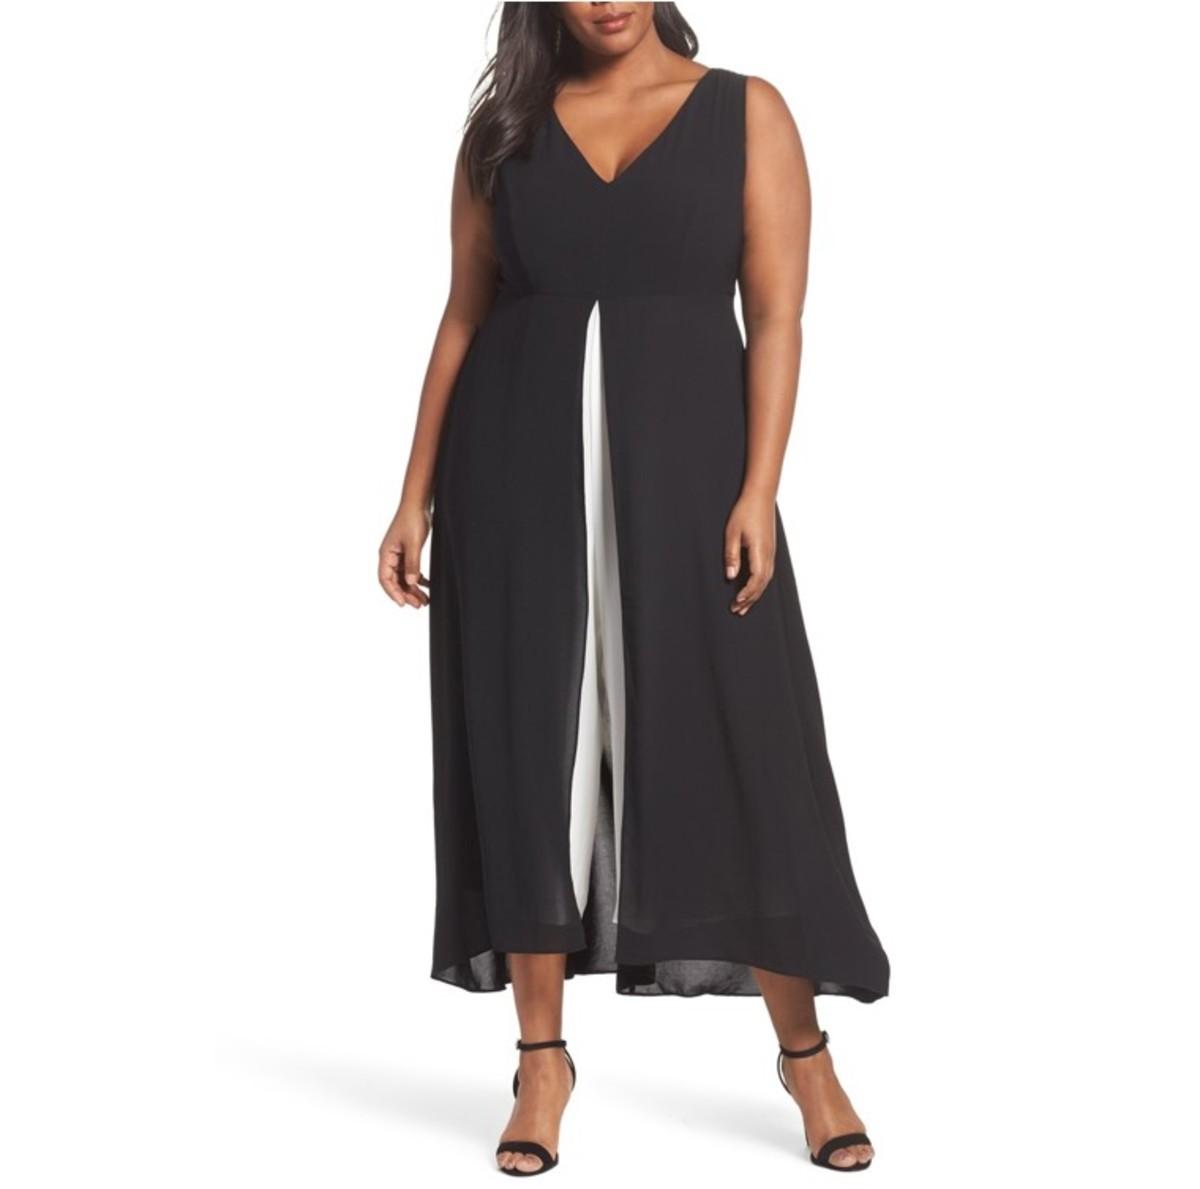 deep V-neck empire-waist black and white jumpsuit